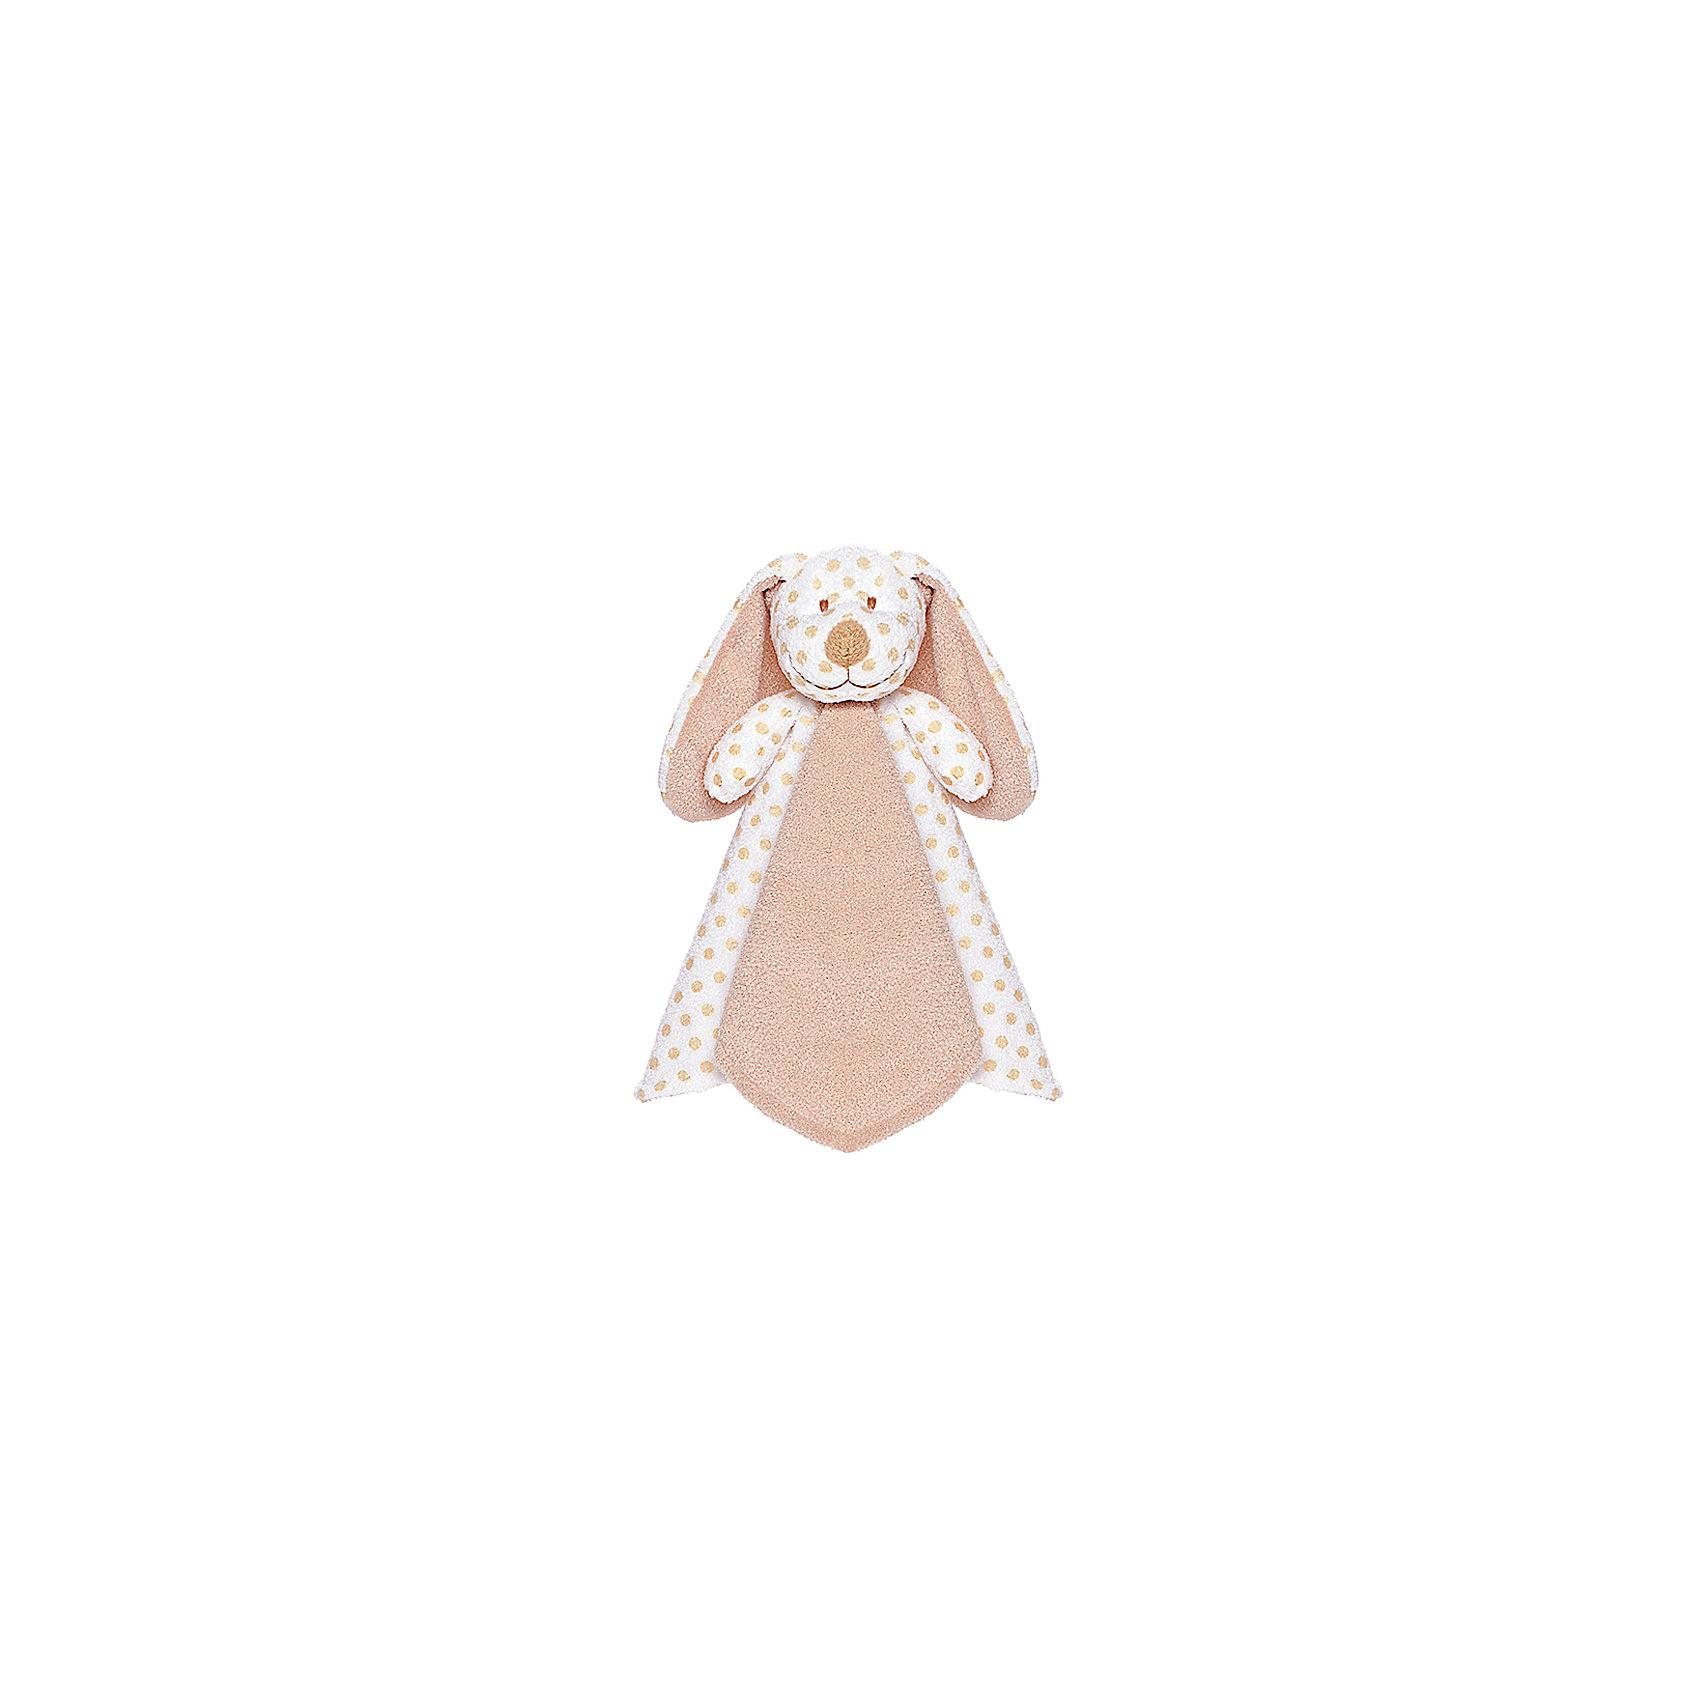 Платочек Собачка -  Большие ушки, Тедди бэби, Teddykompaniet